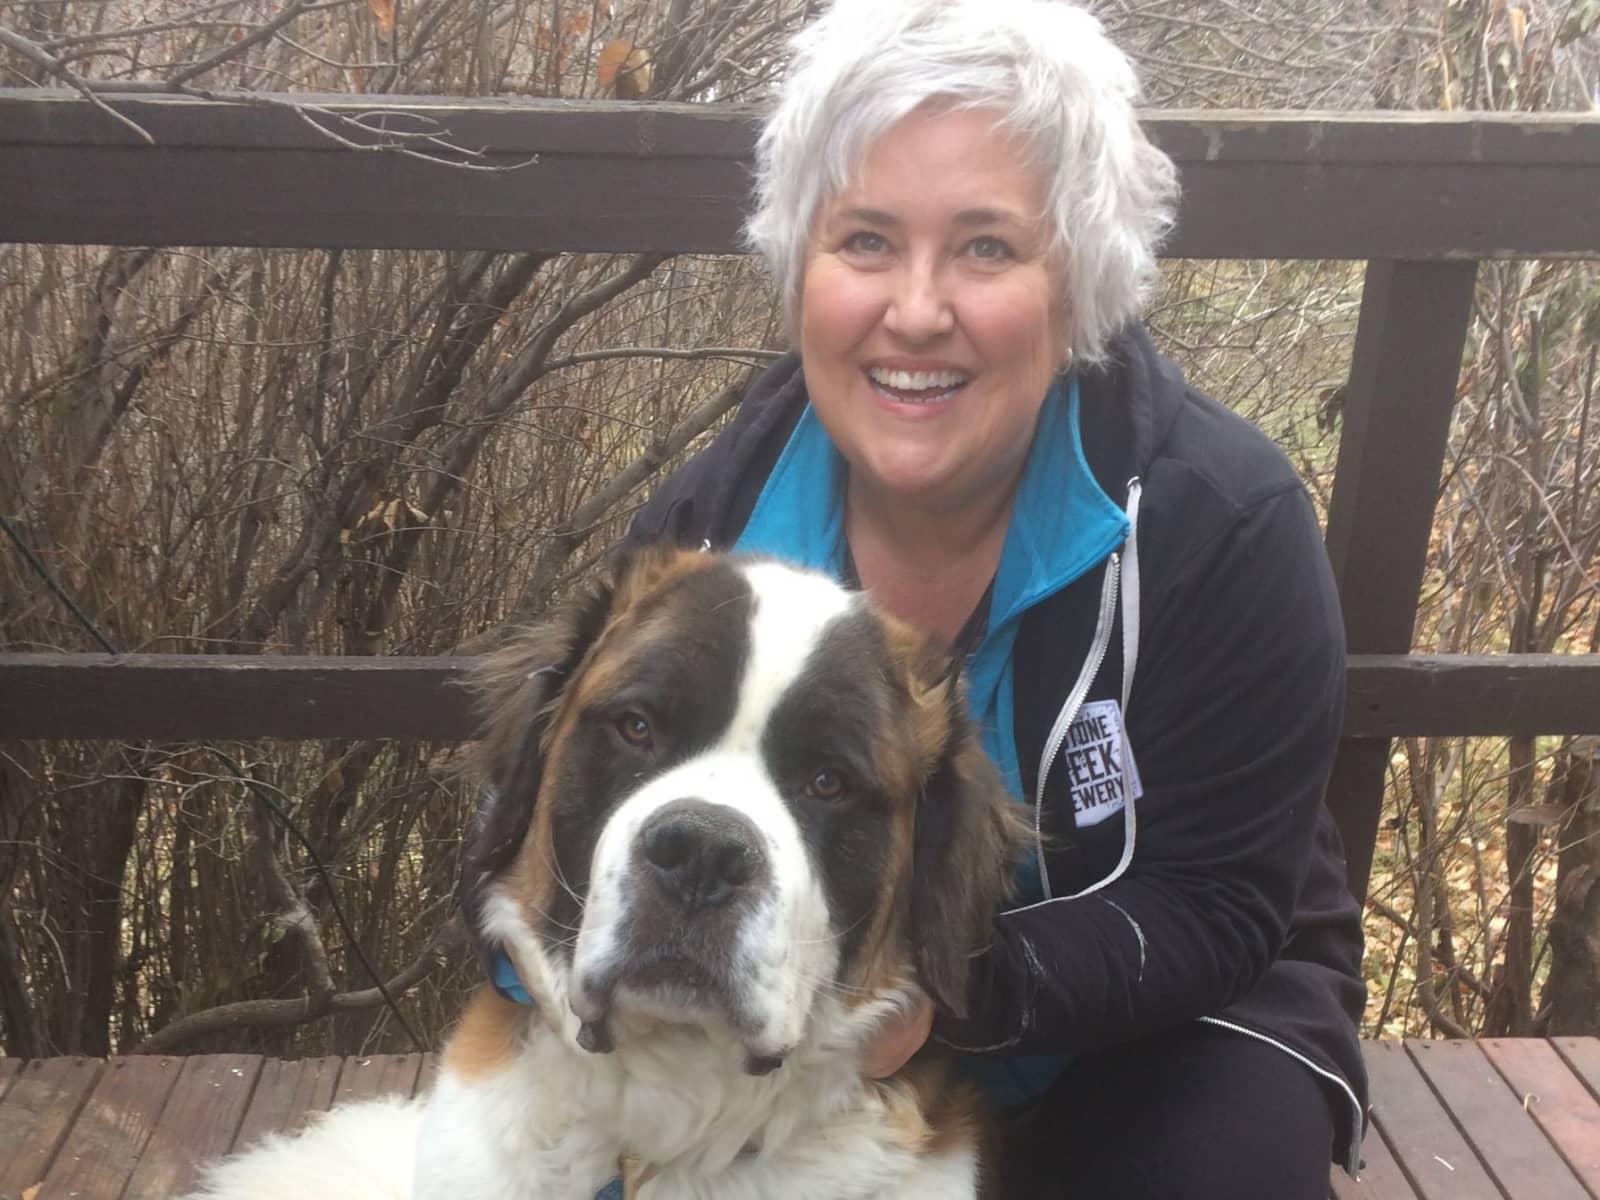 Wendy from Calgary, Alberta, Canada